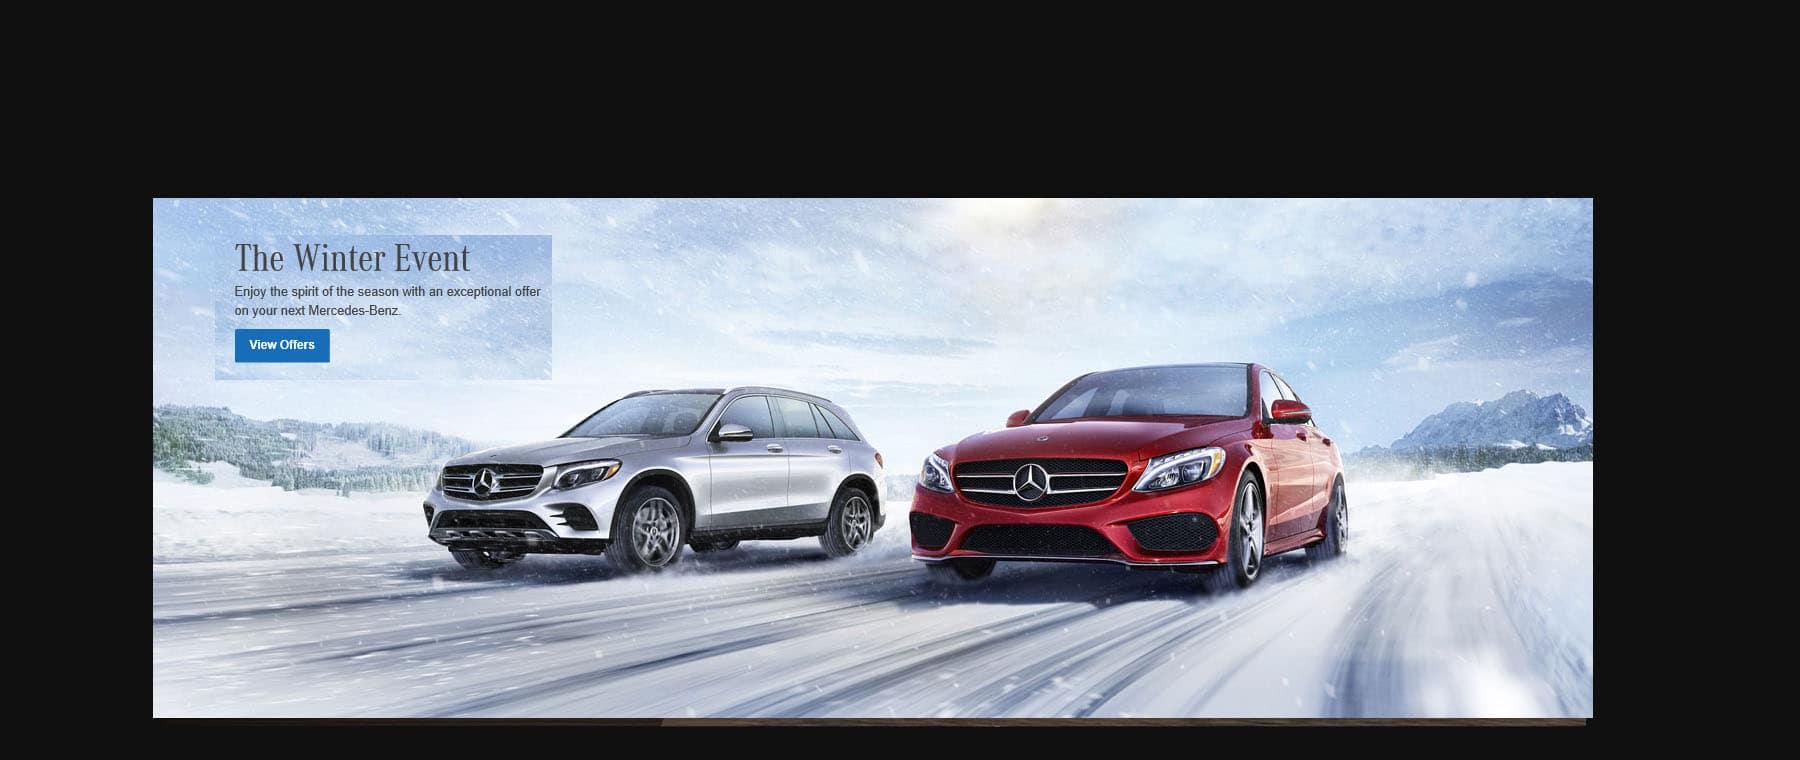 Mercedes Benz Winter Event Sale